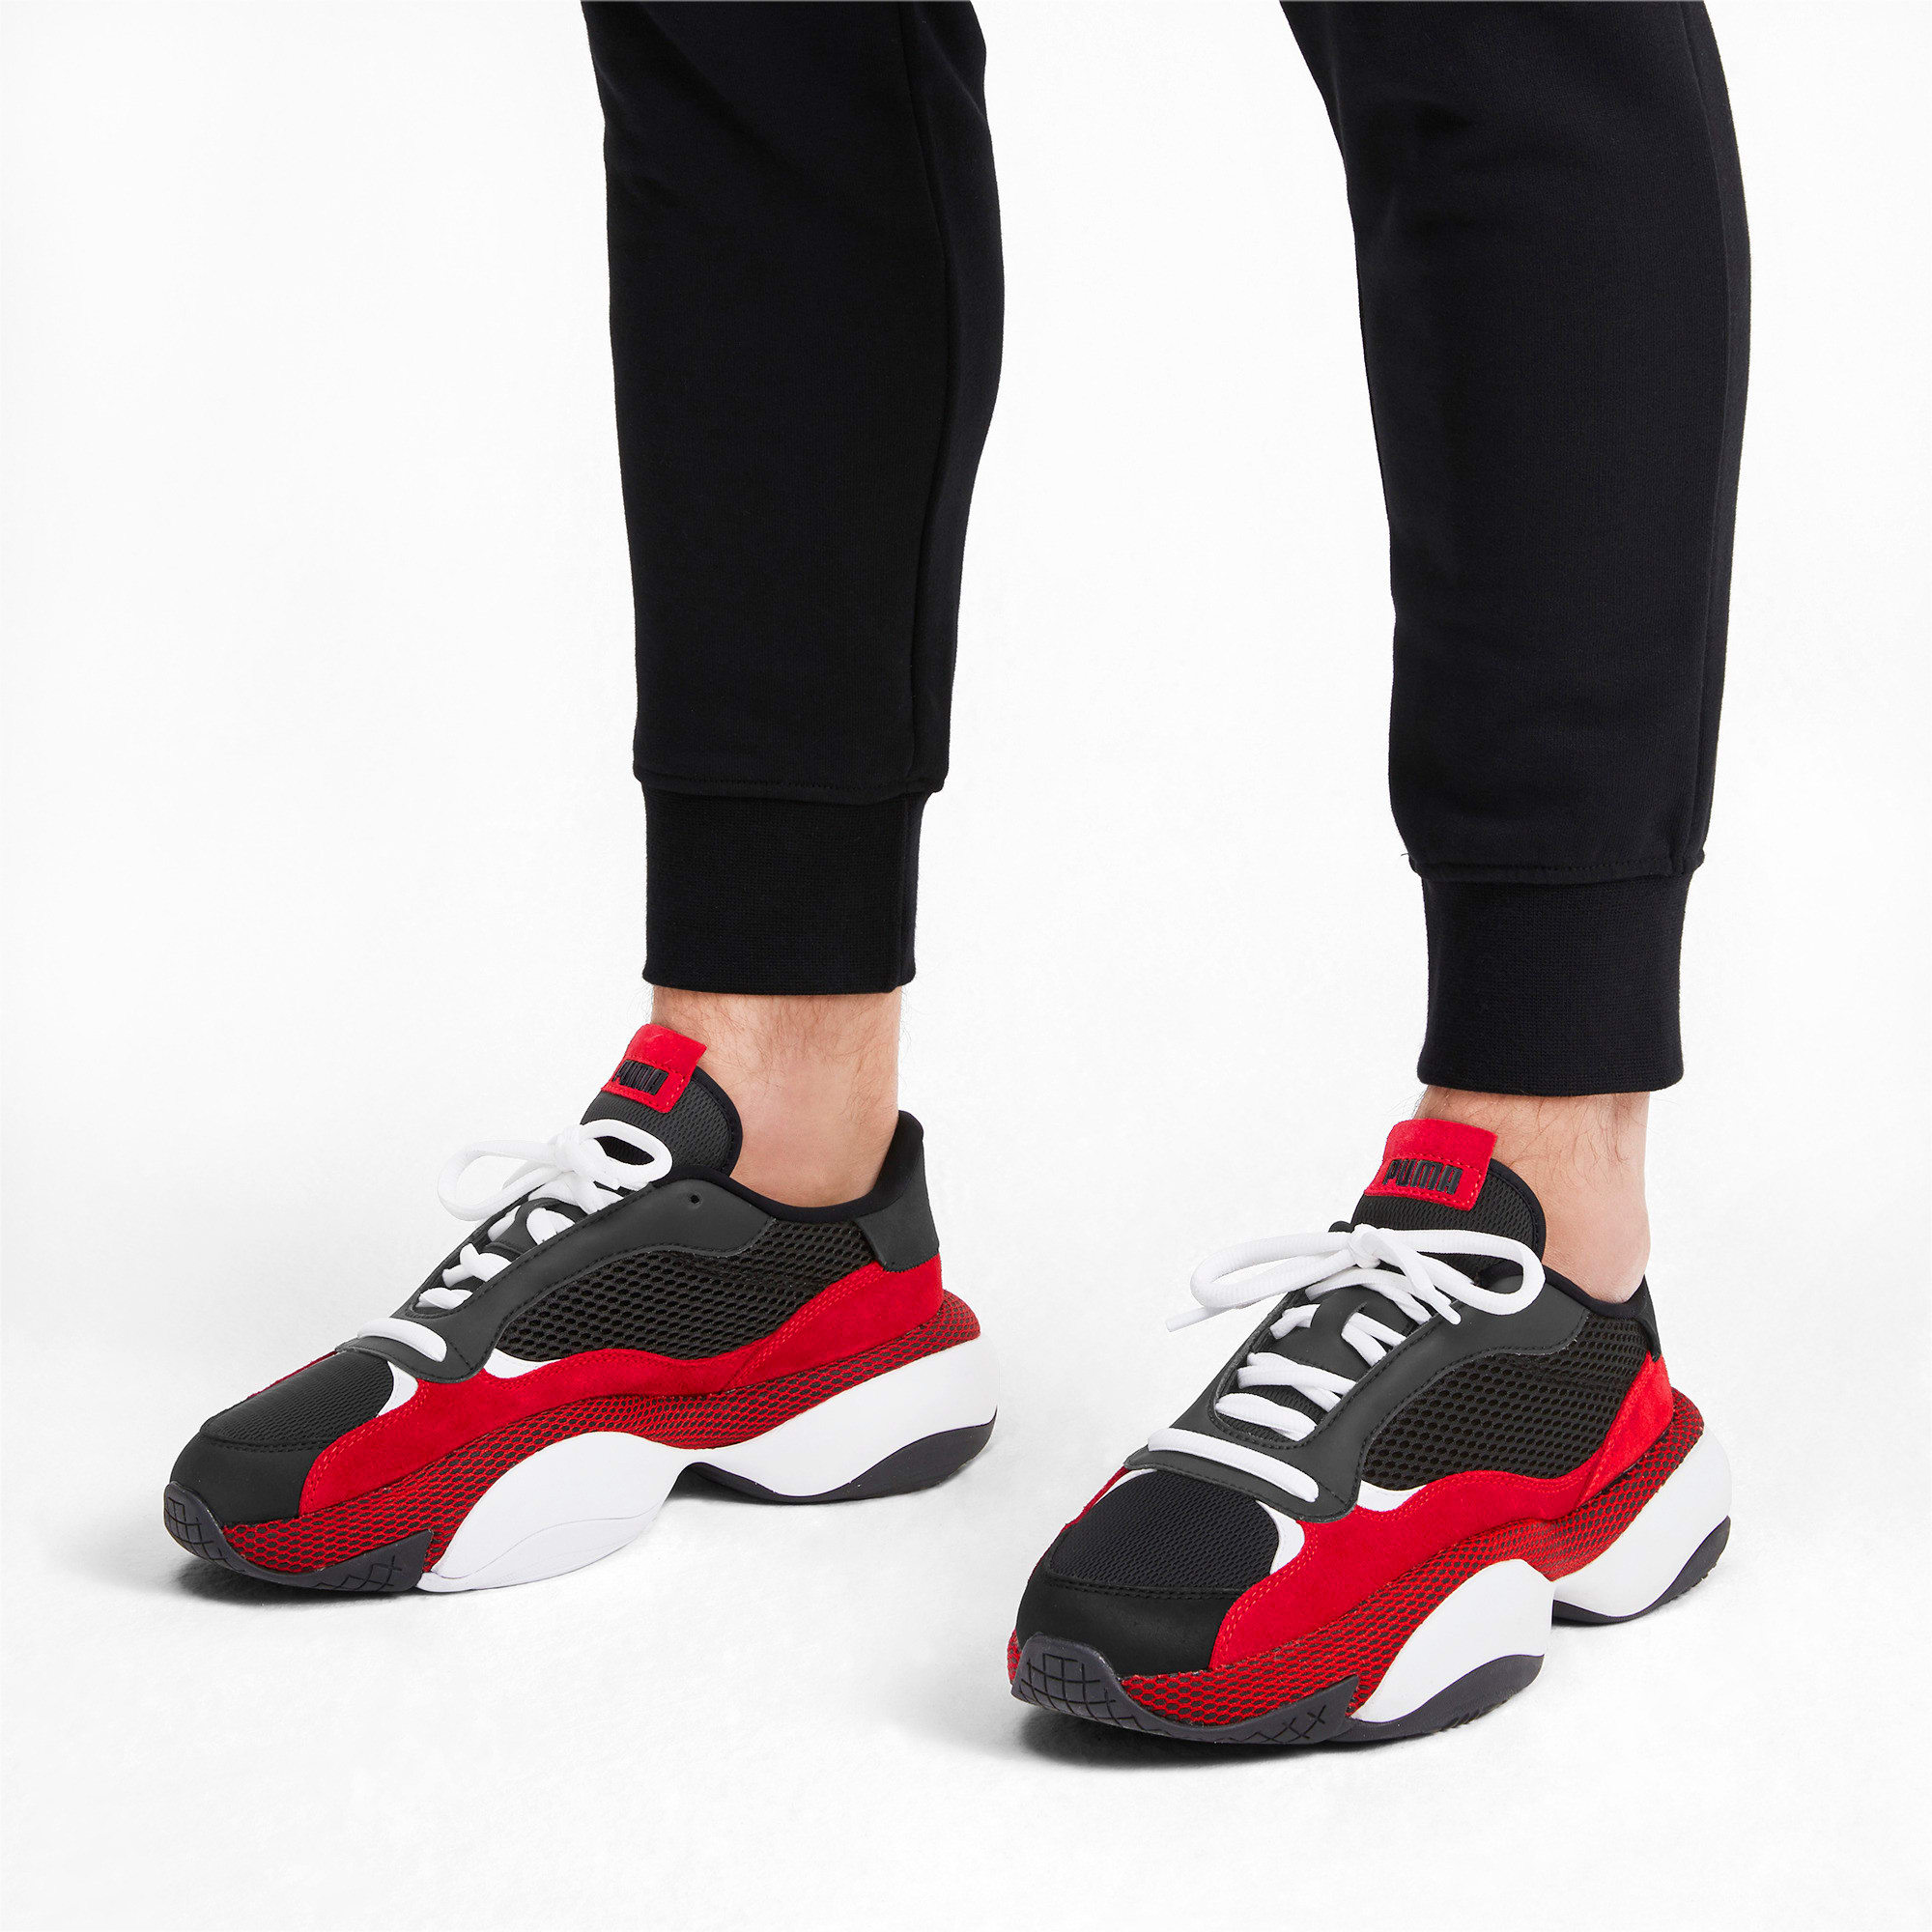 Thumbnail 2 of Alteration Blitz Sneakers, Puma Black-High Risk Red, medium